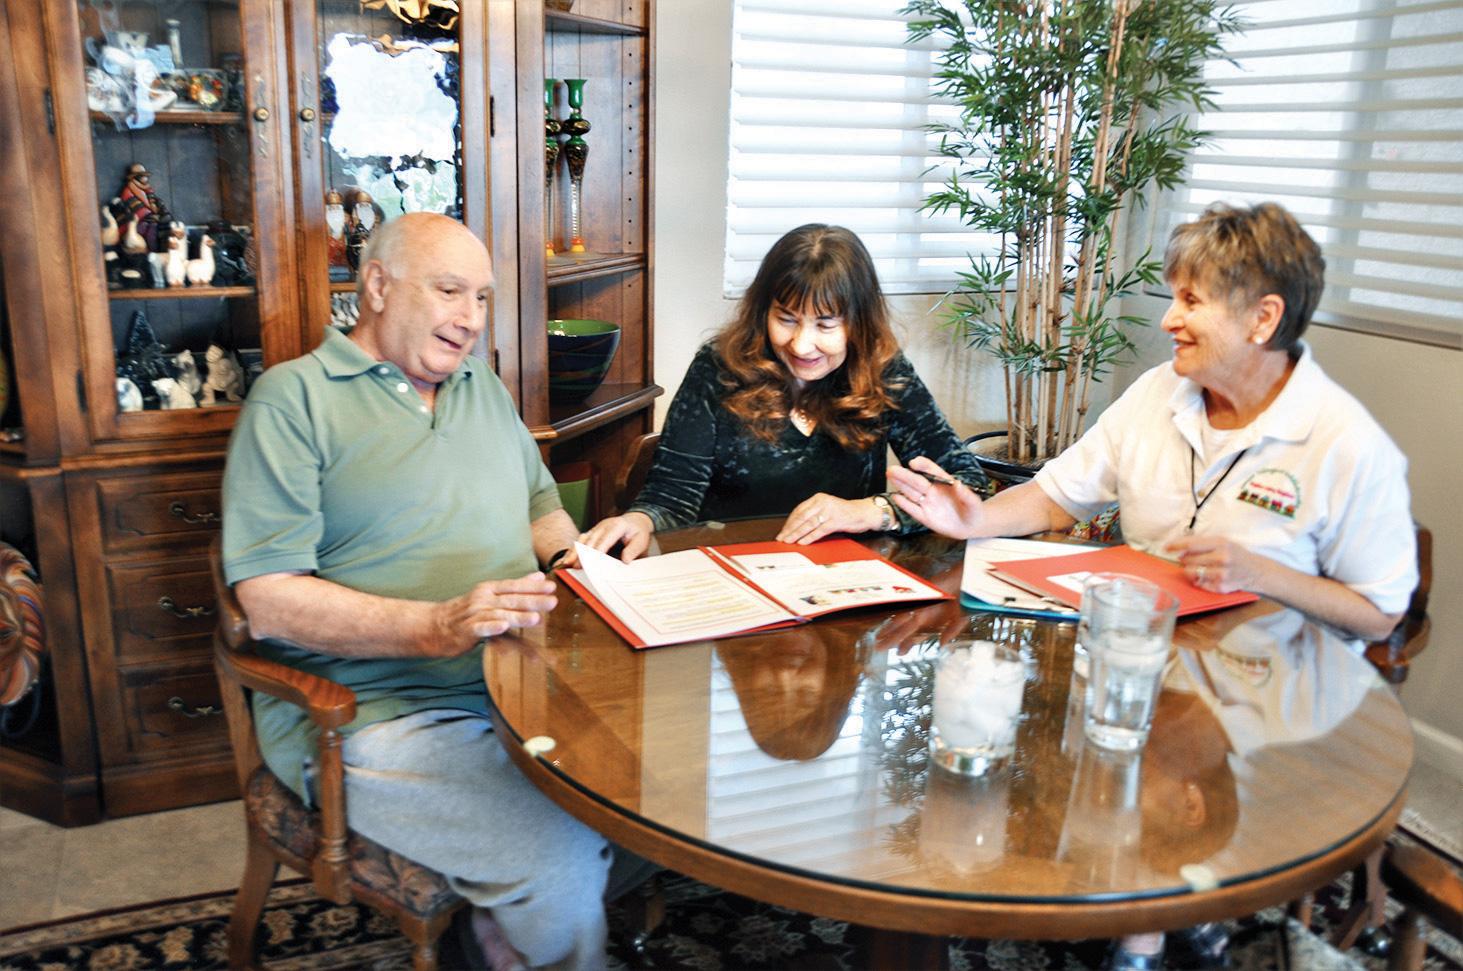 Vicki and Nick Palumbo meet with membership volunteer, LaVonne Ashwood, to join Senior Village.